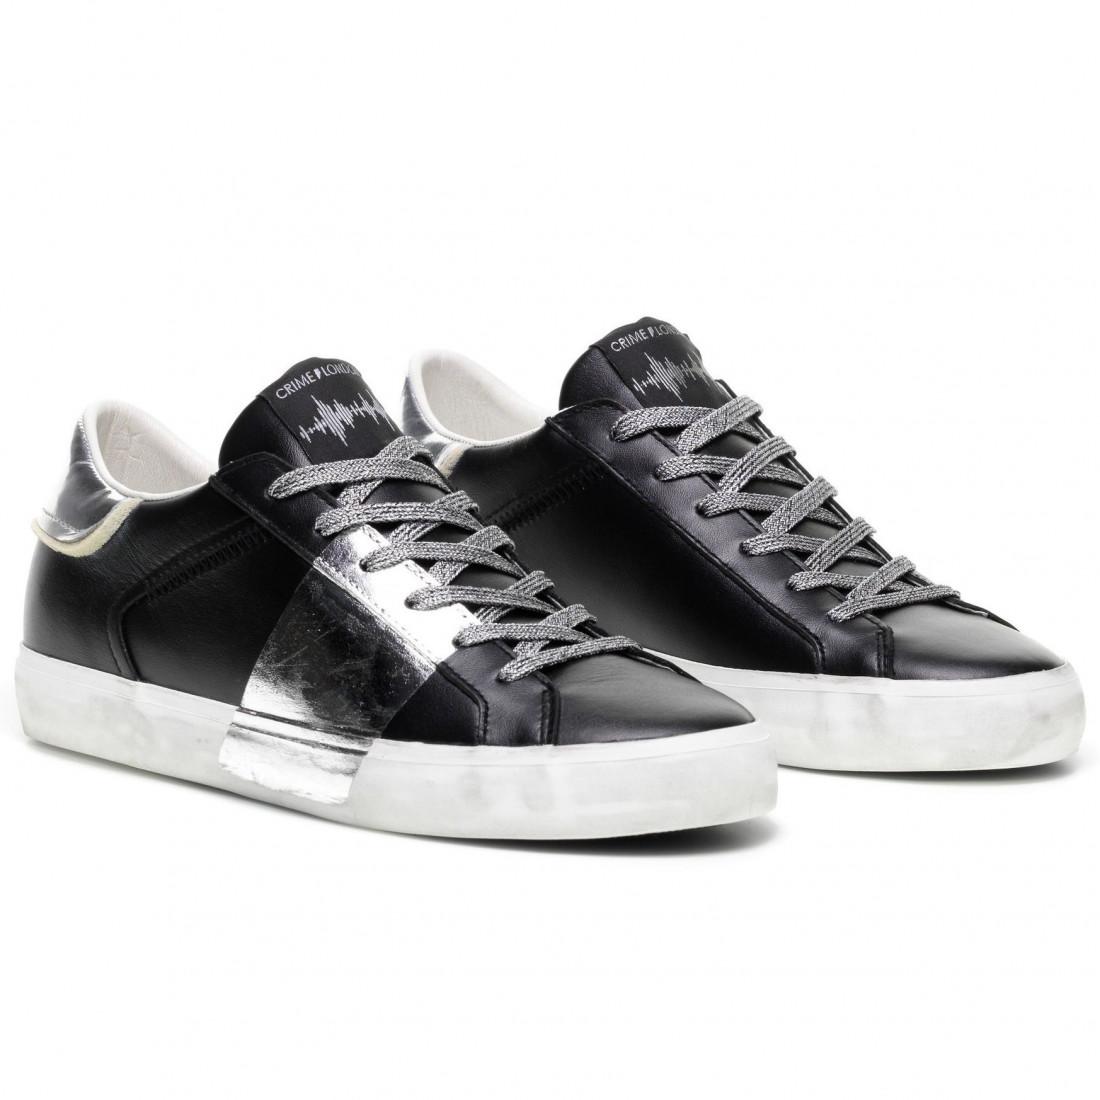 sneakers donna crime london 2500620 black 7839